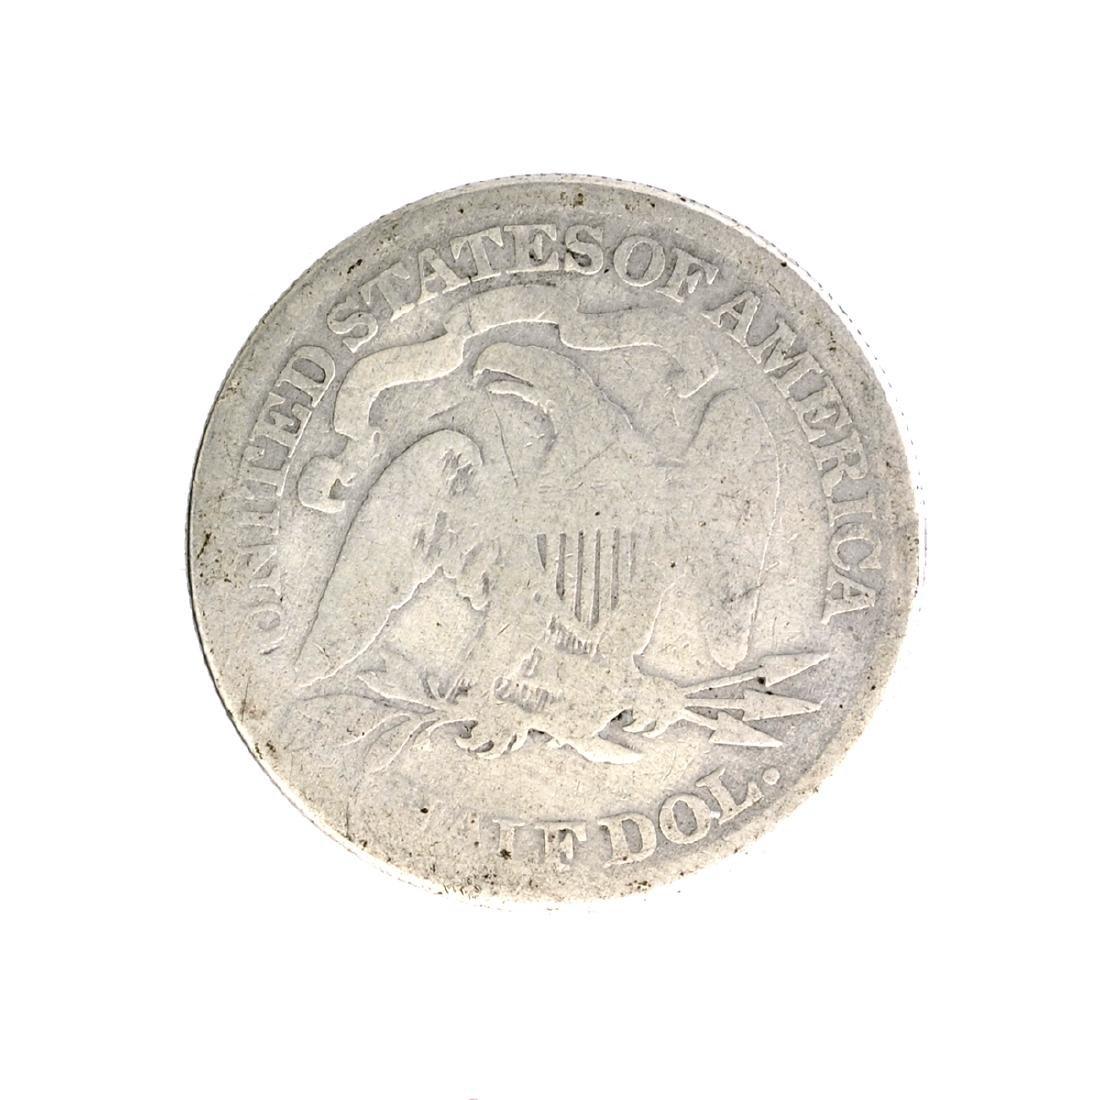 1869 Liberty Seated Half Dollar Coin - 2